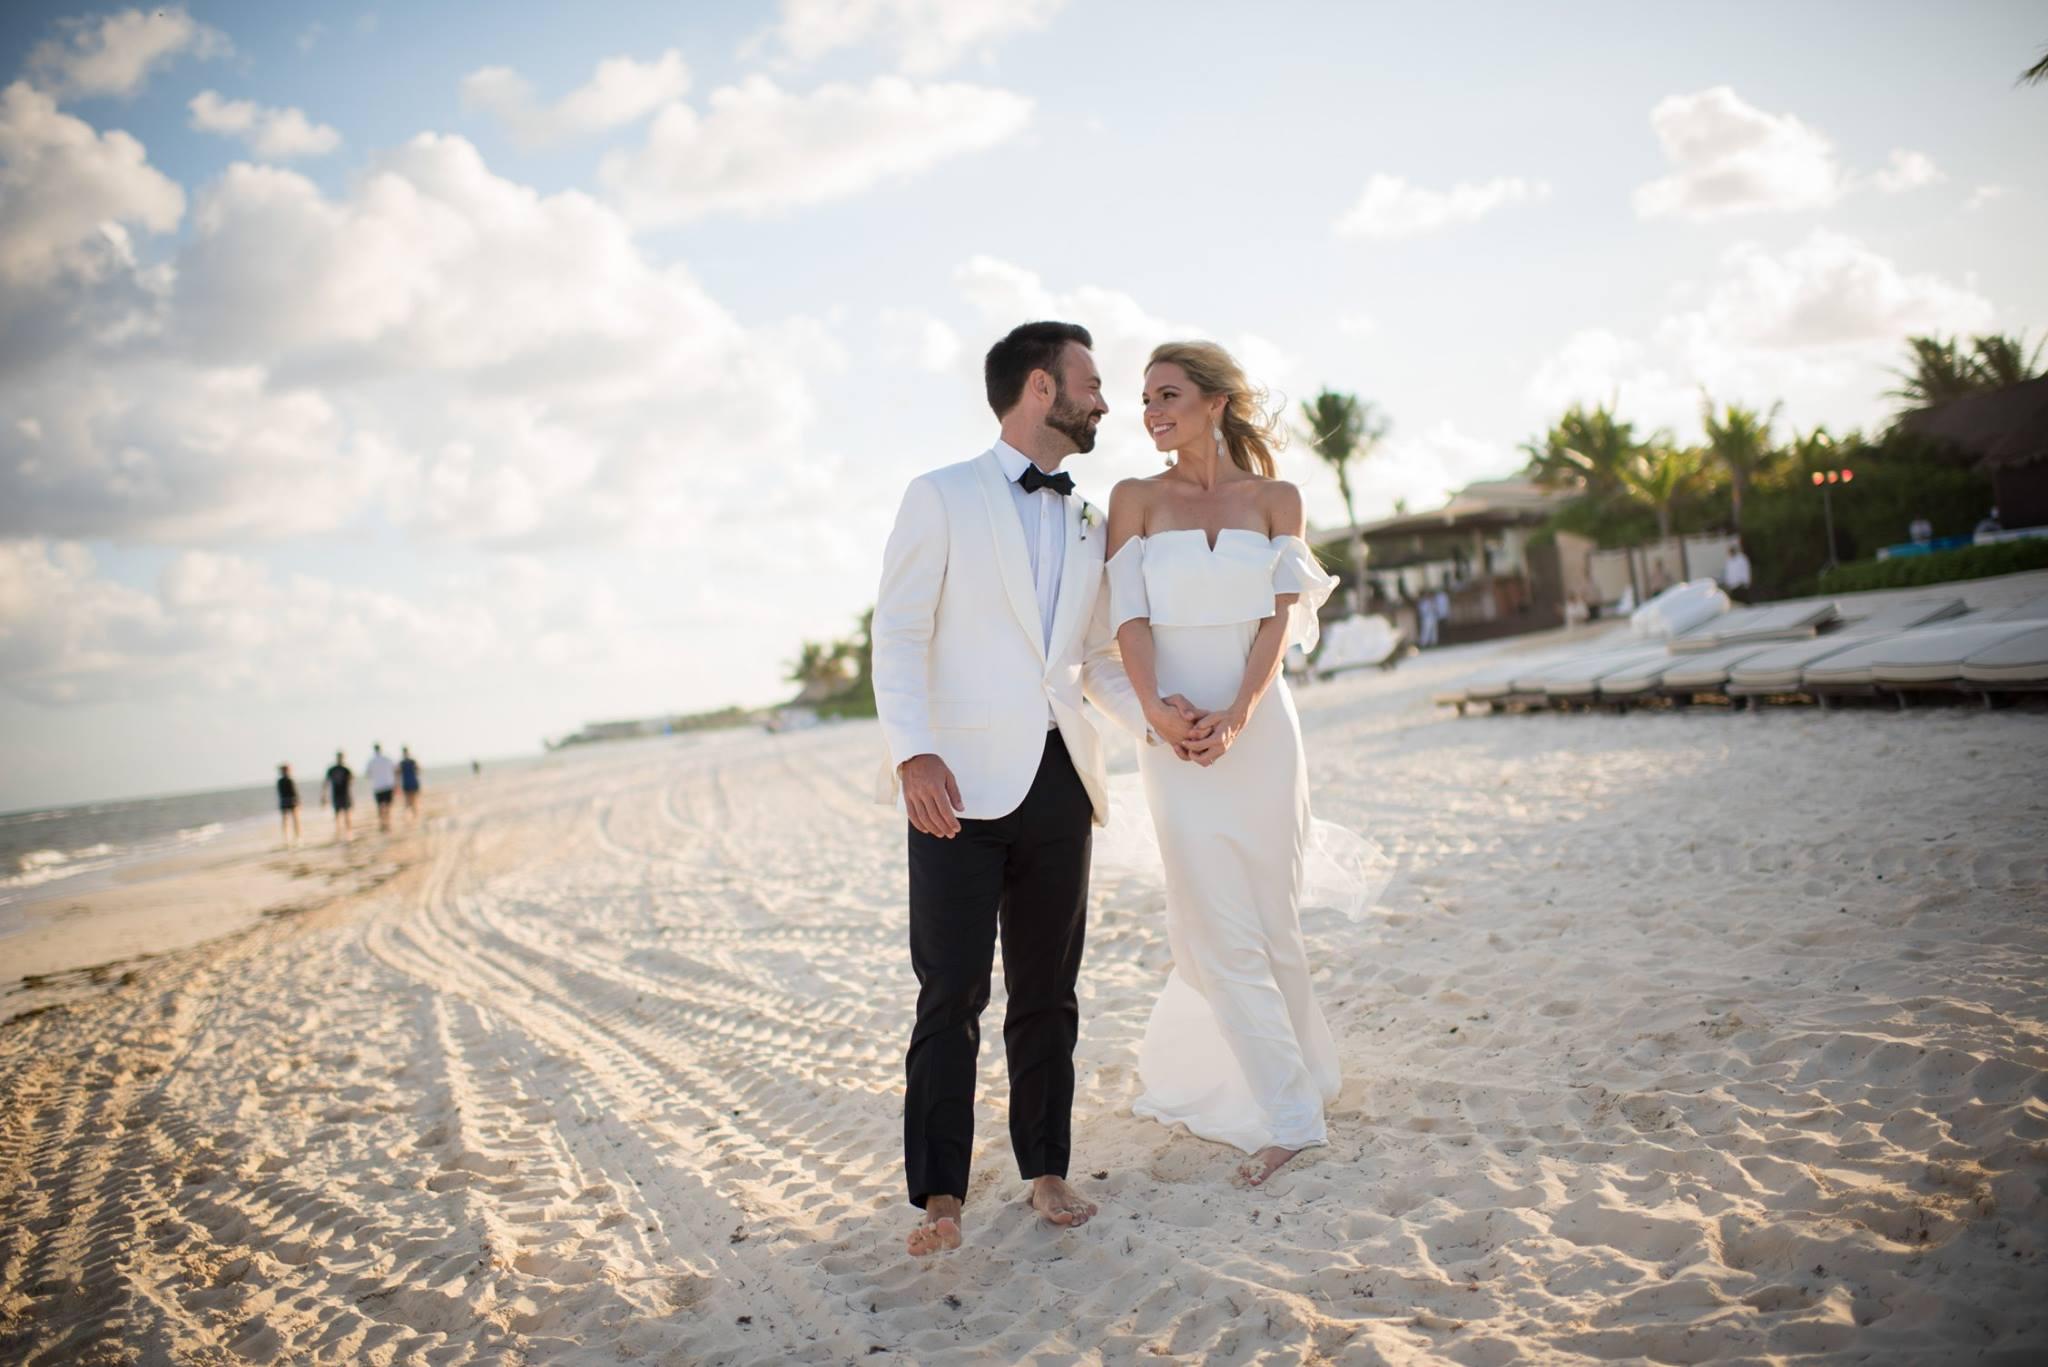 Destination wedding planning tips: 17 things I wish I knew